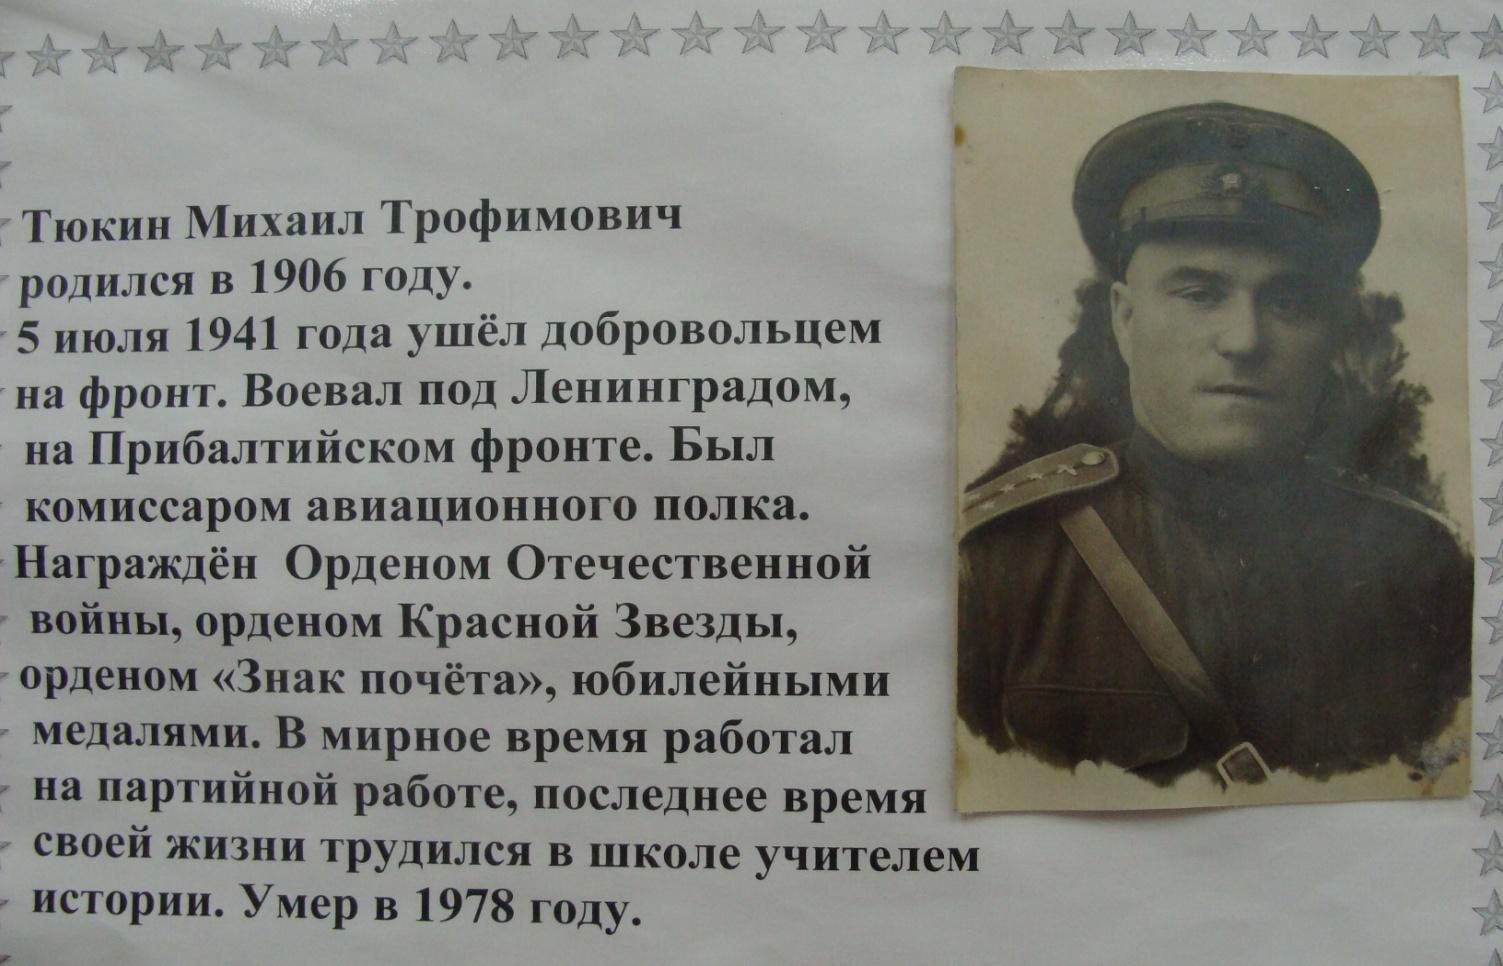 G:\Ветераны -ленинградцы\DSC08150.JPG